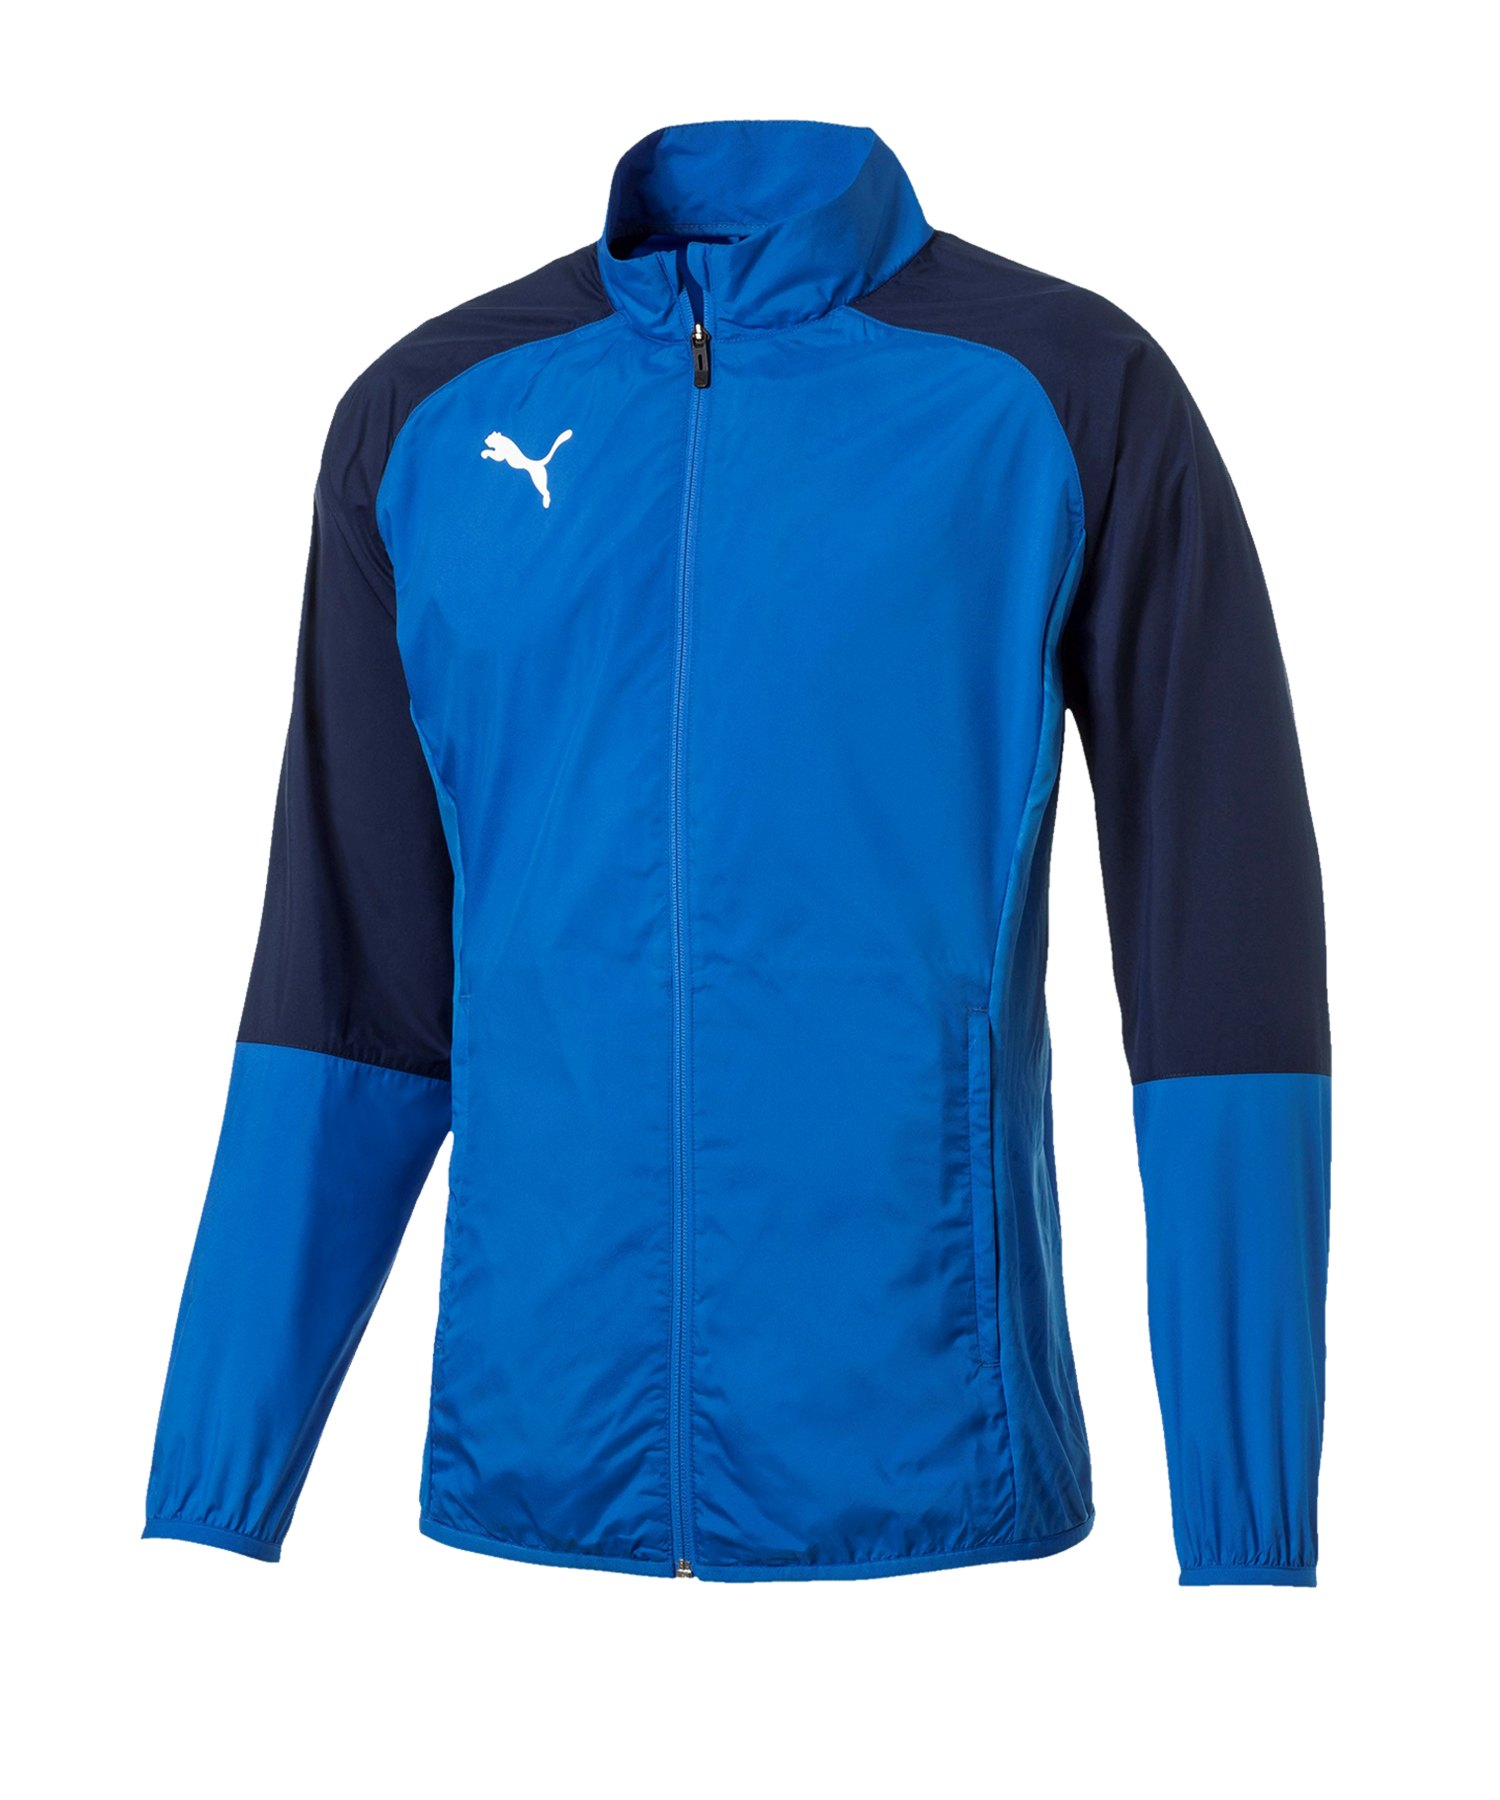 PUMA CUP Sideline Core Woven Jacket Blau F02 - blau